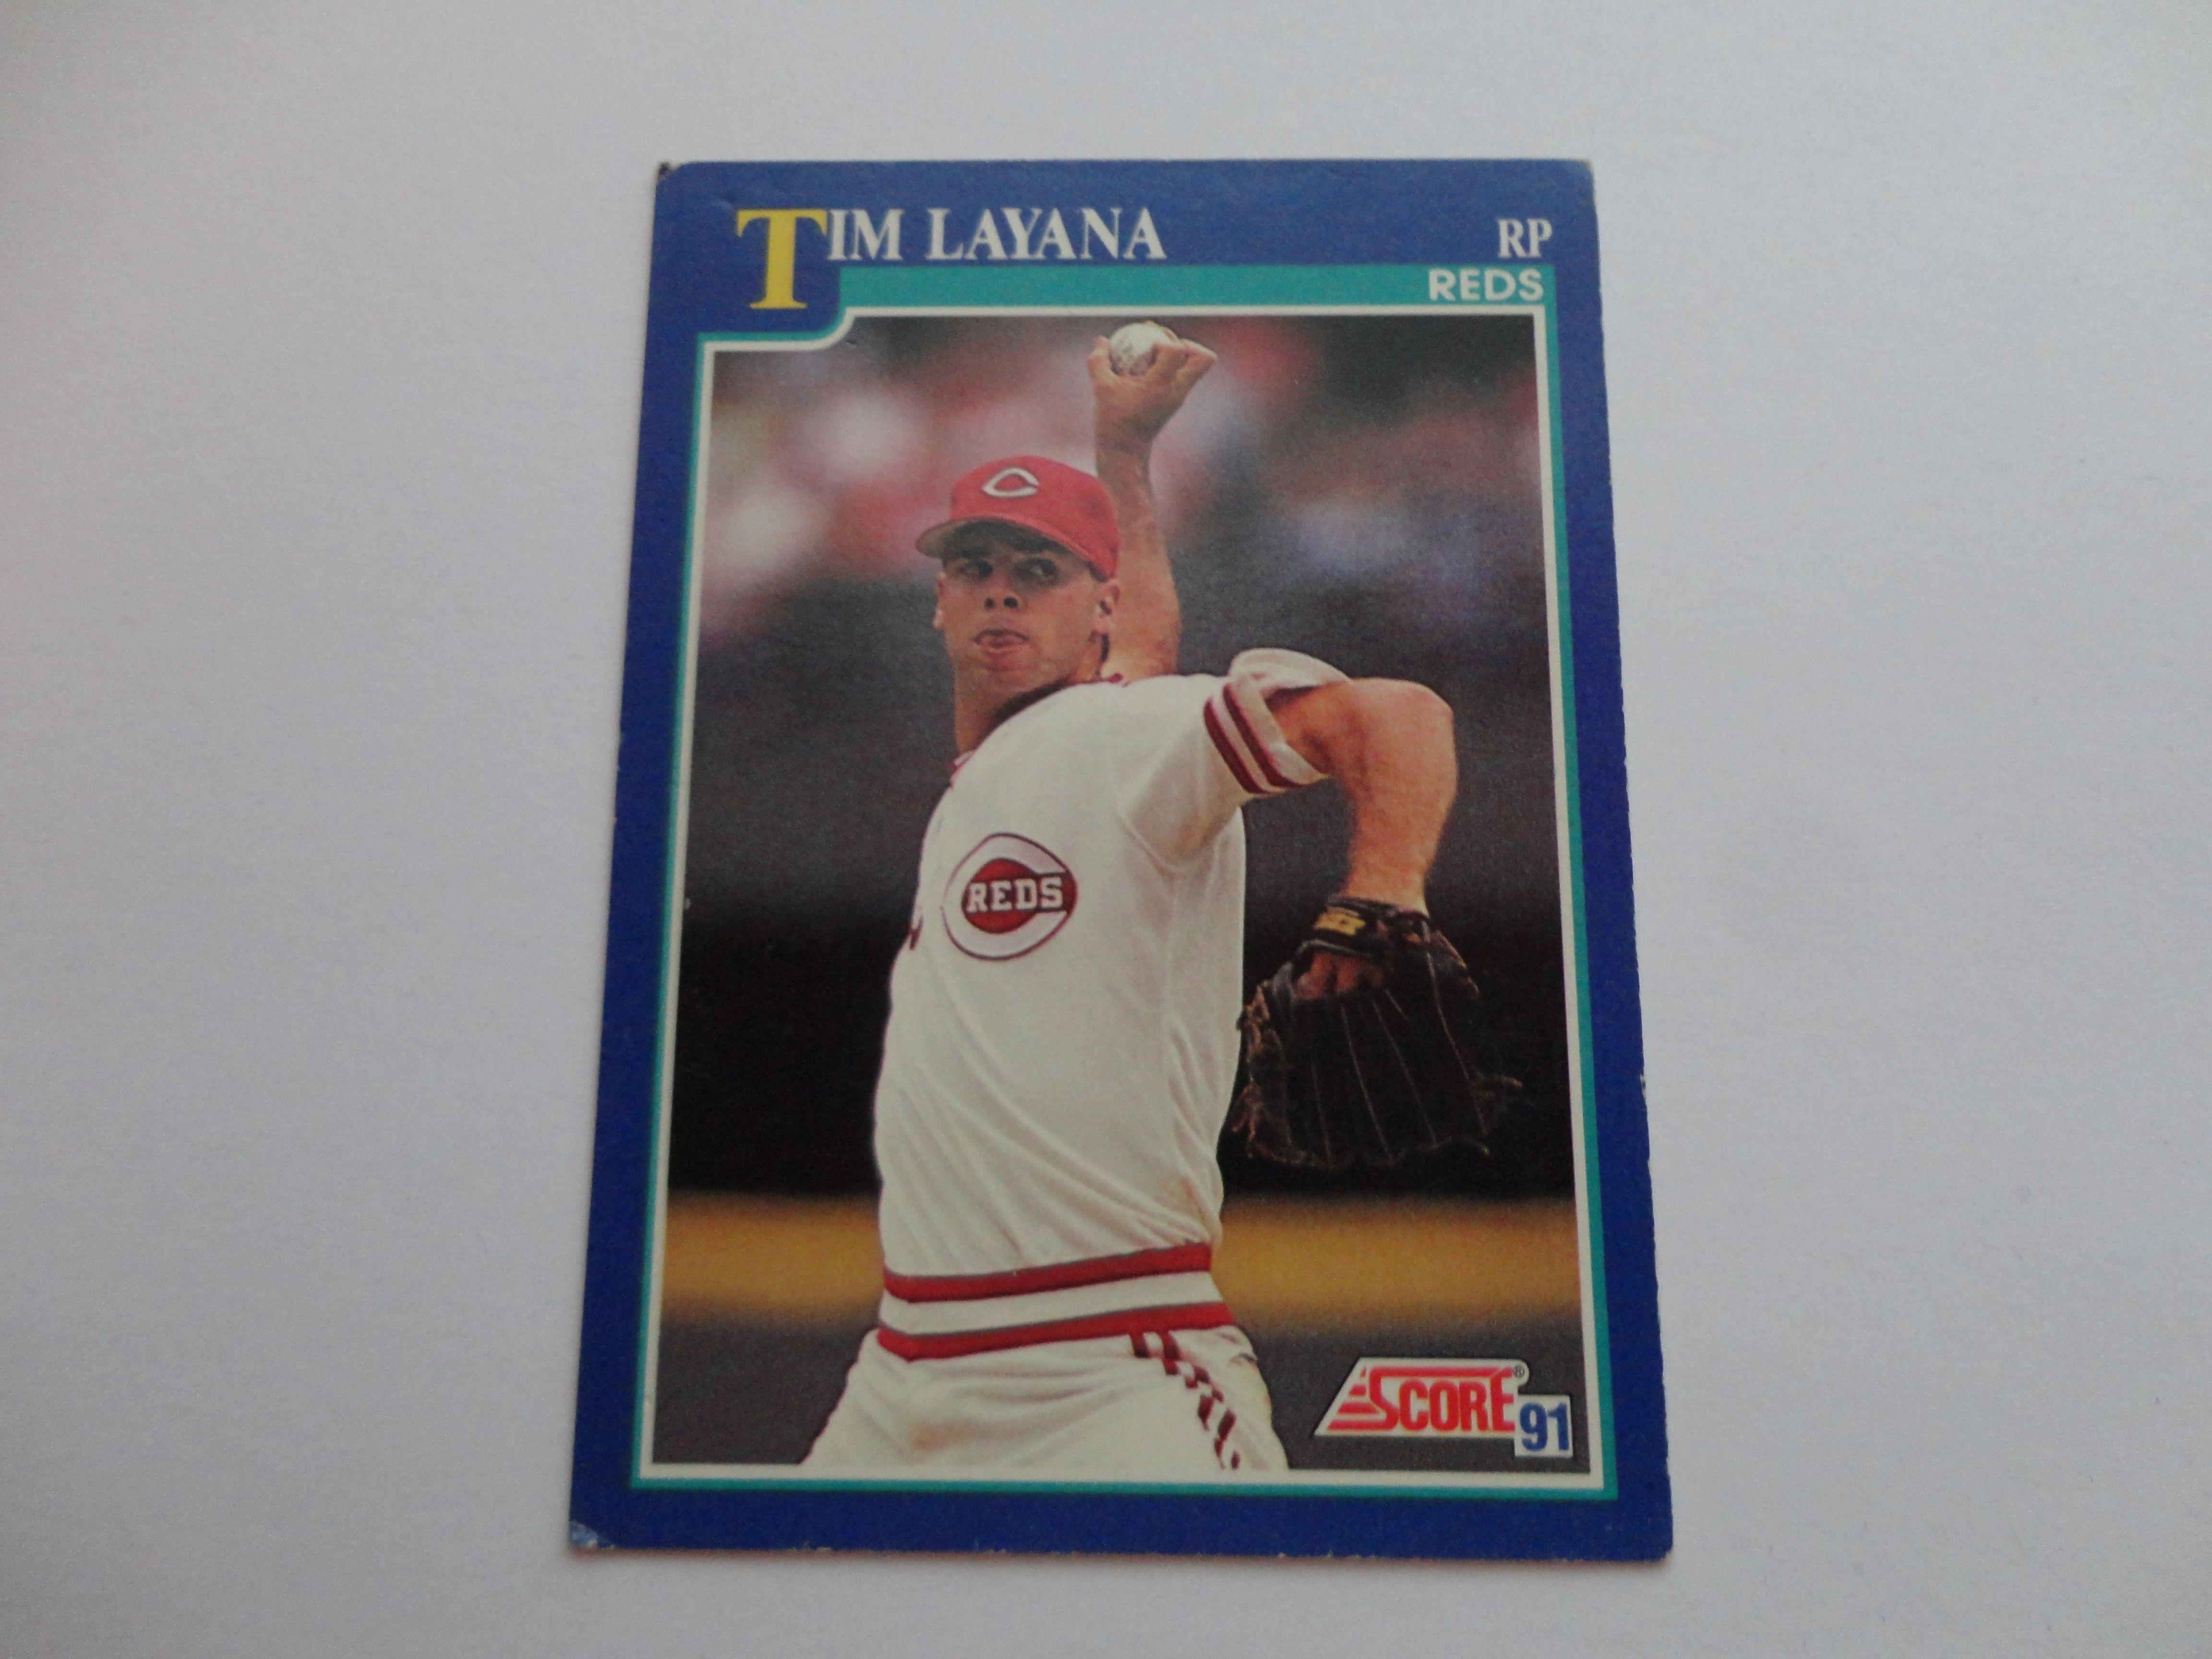 Tim Layana 1991 Score Baseball Card Baseball Cards Baseball